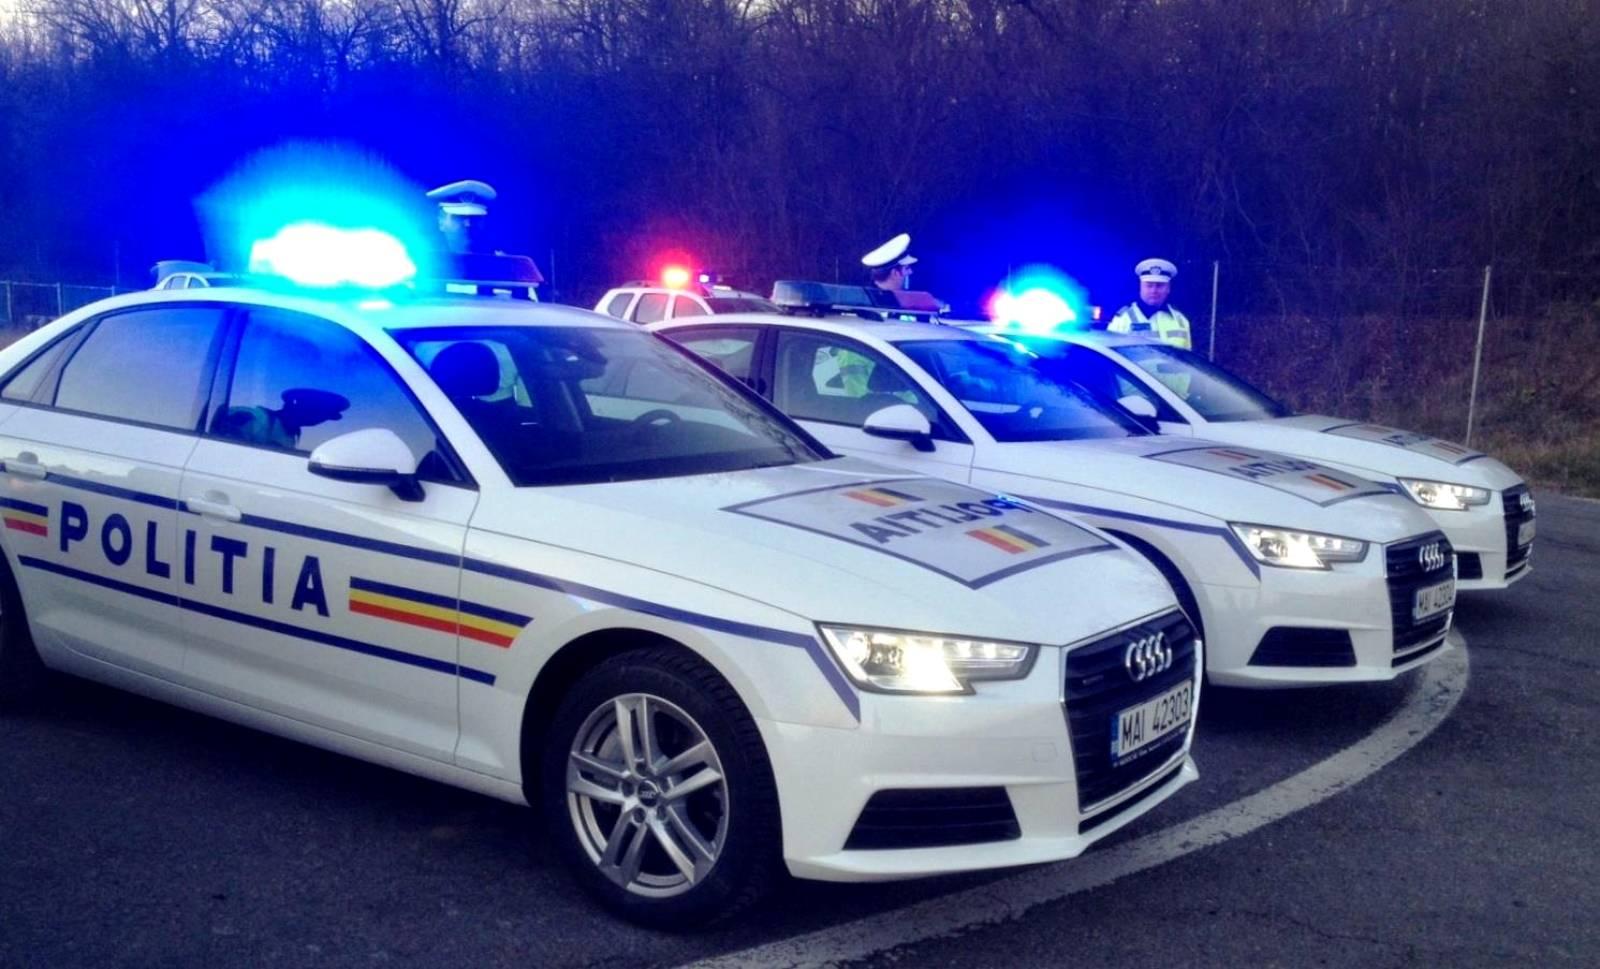 Politia Romana alerta phishing romani